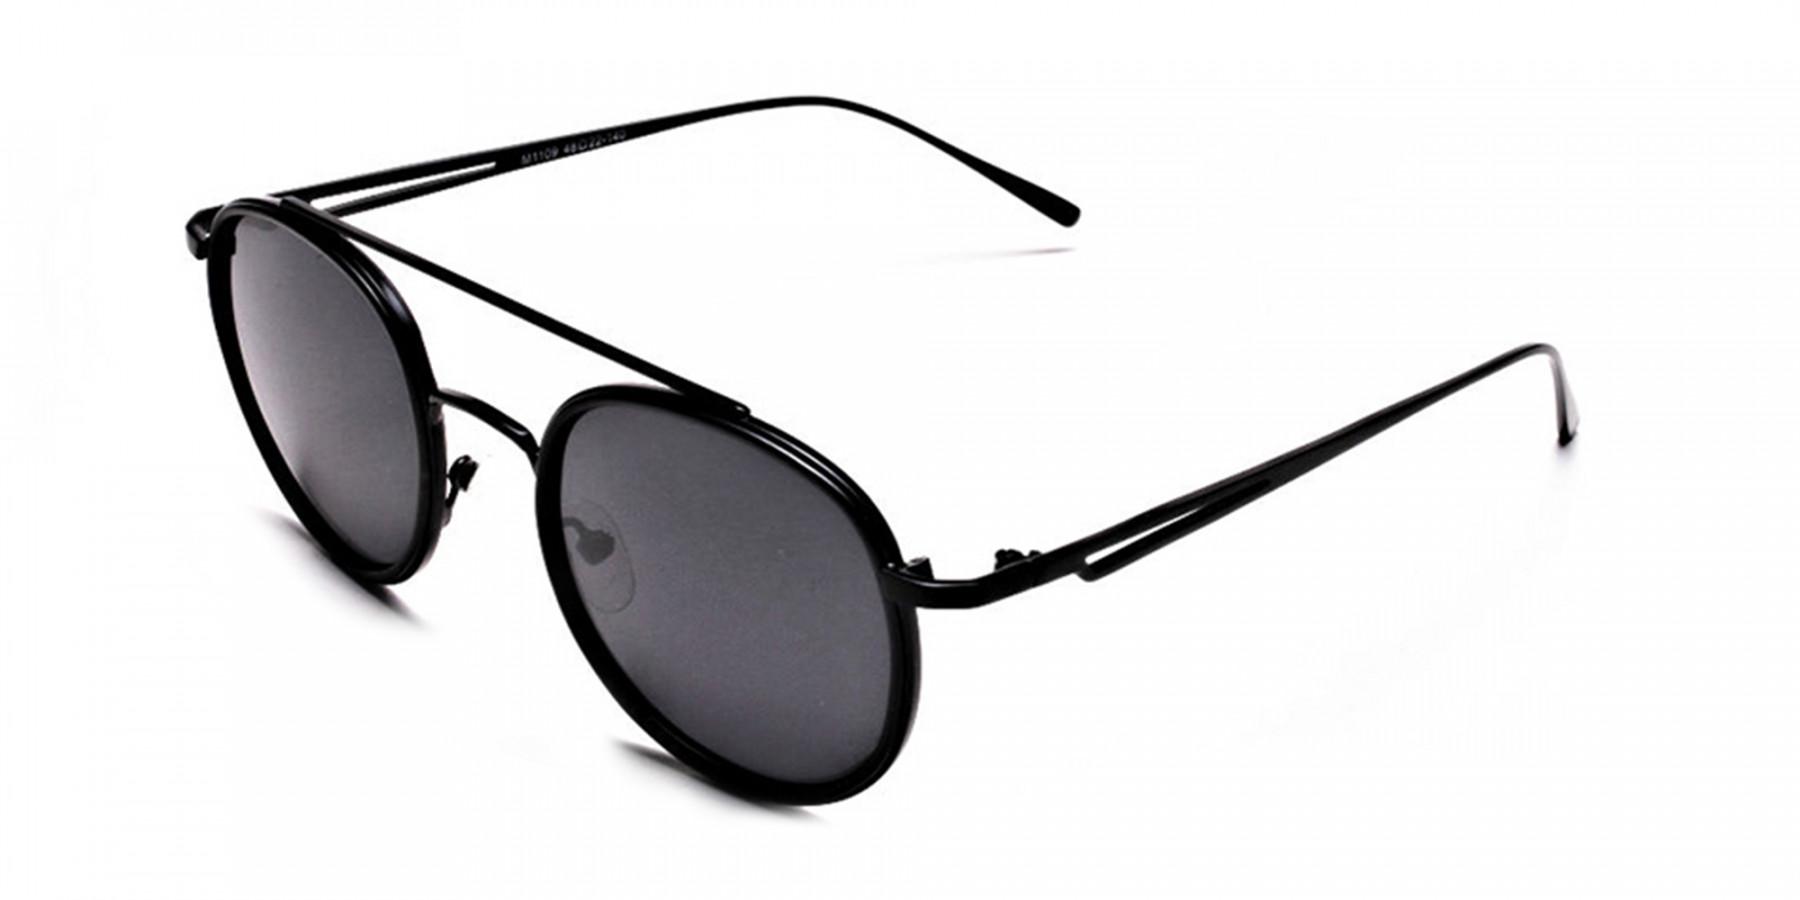 Black Round Metal Sunglasses - 2